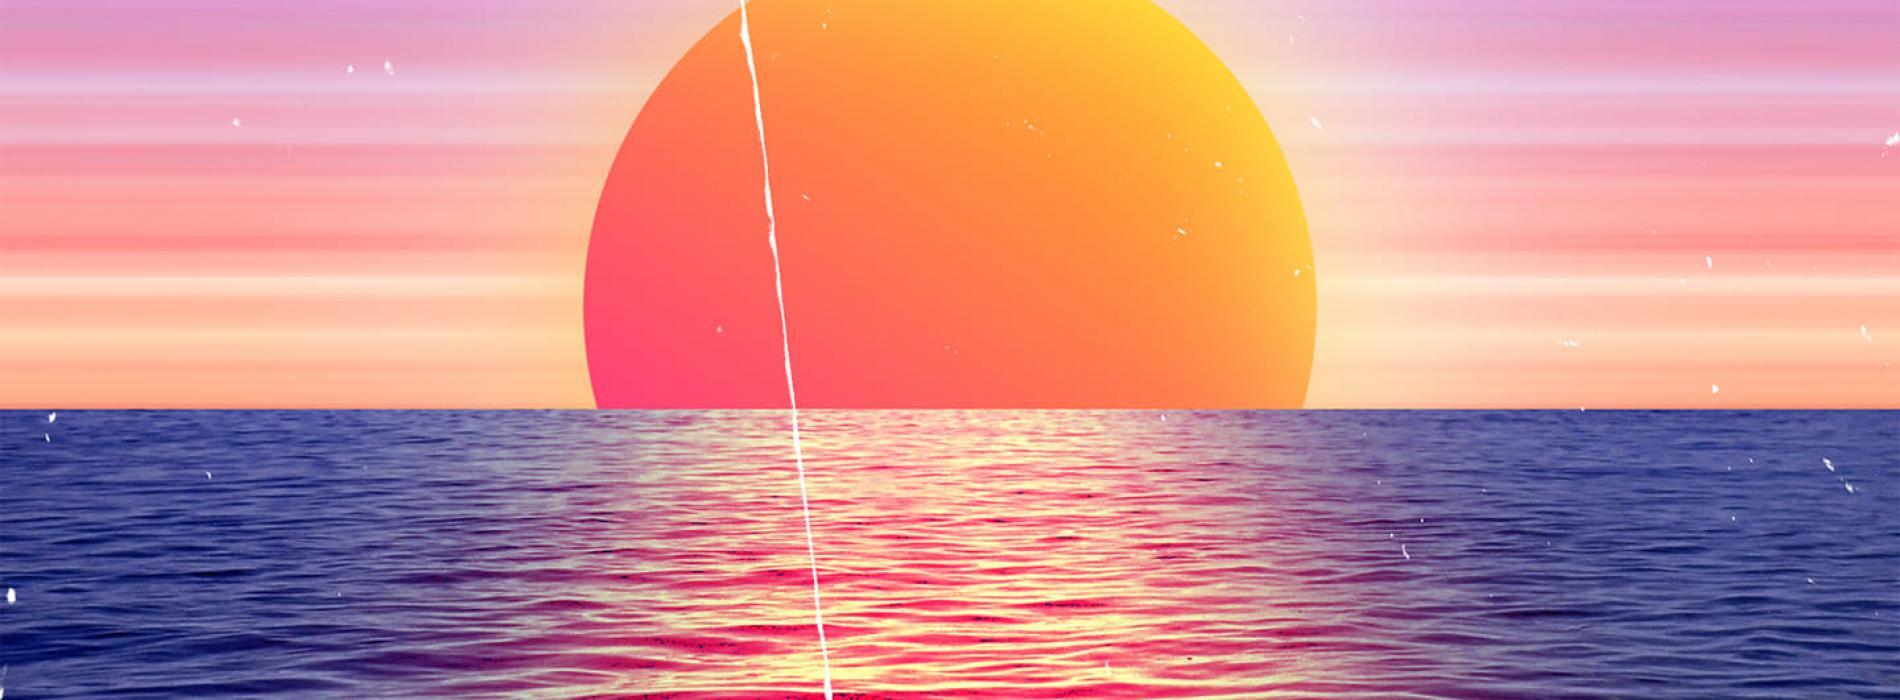 New Music : KVN J – Come Back Home Ft Youngballer (Official Lyrics Video)